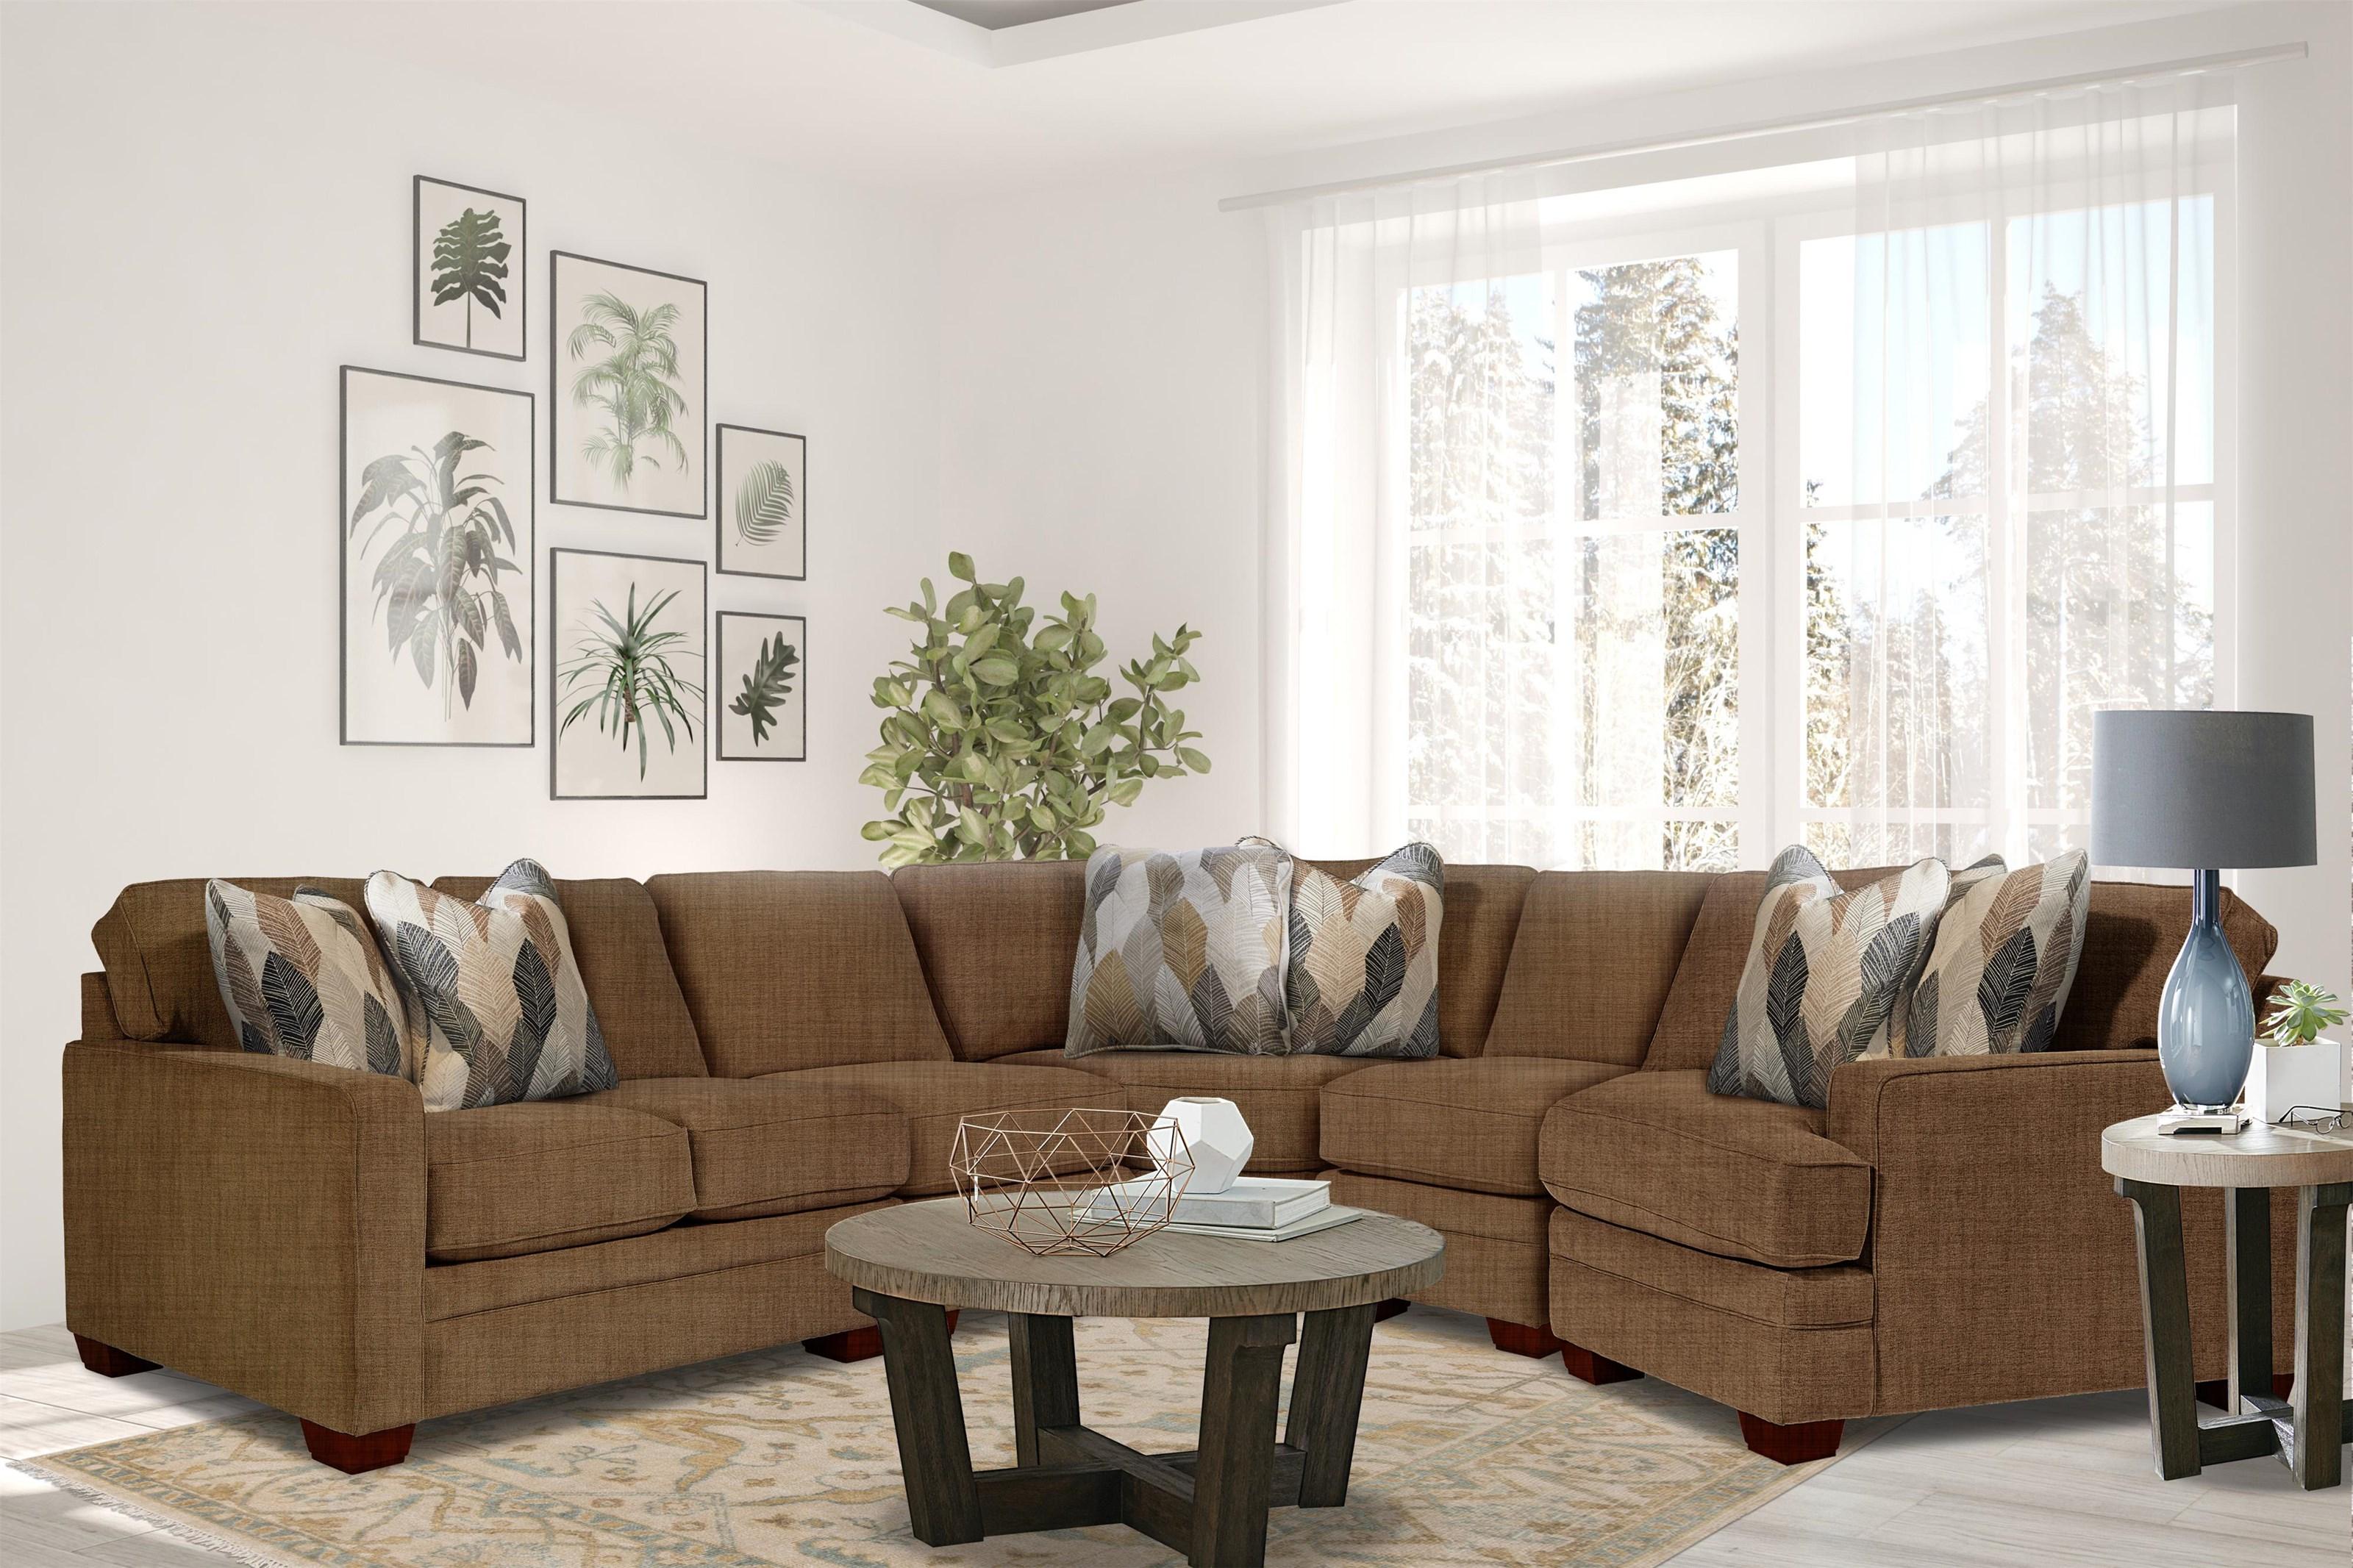 Meyer Meyer Sectional Sofa by La-Z-Boy at Morris Home